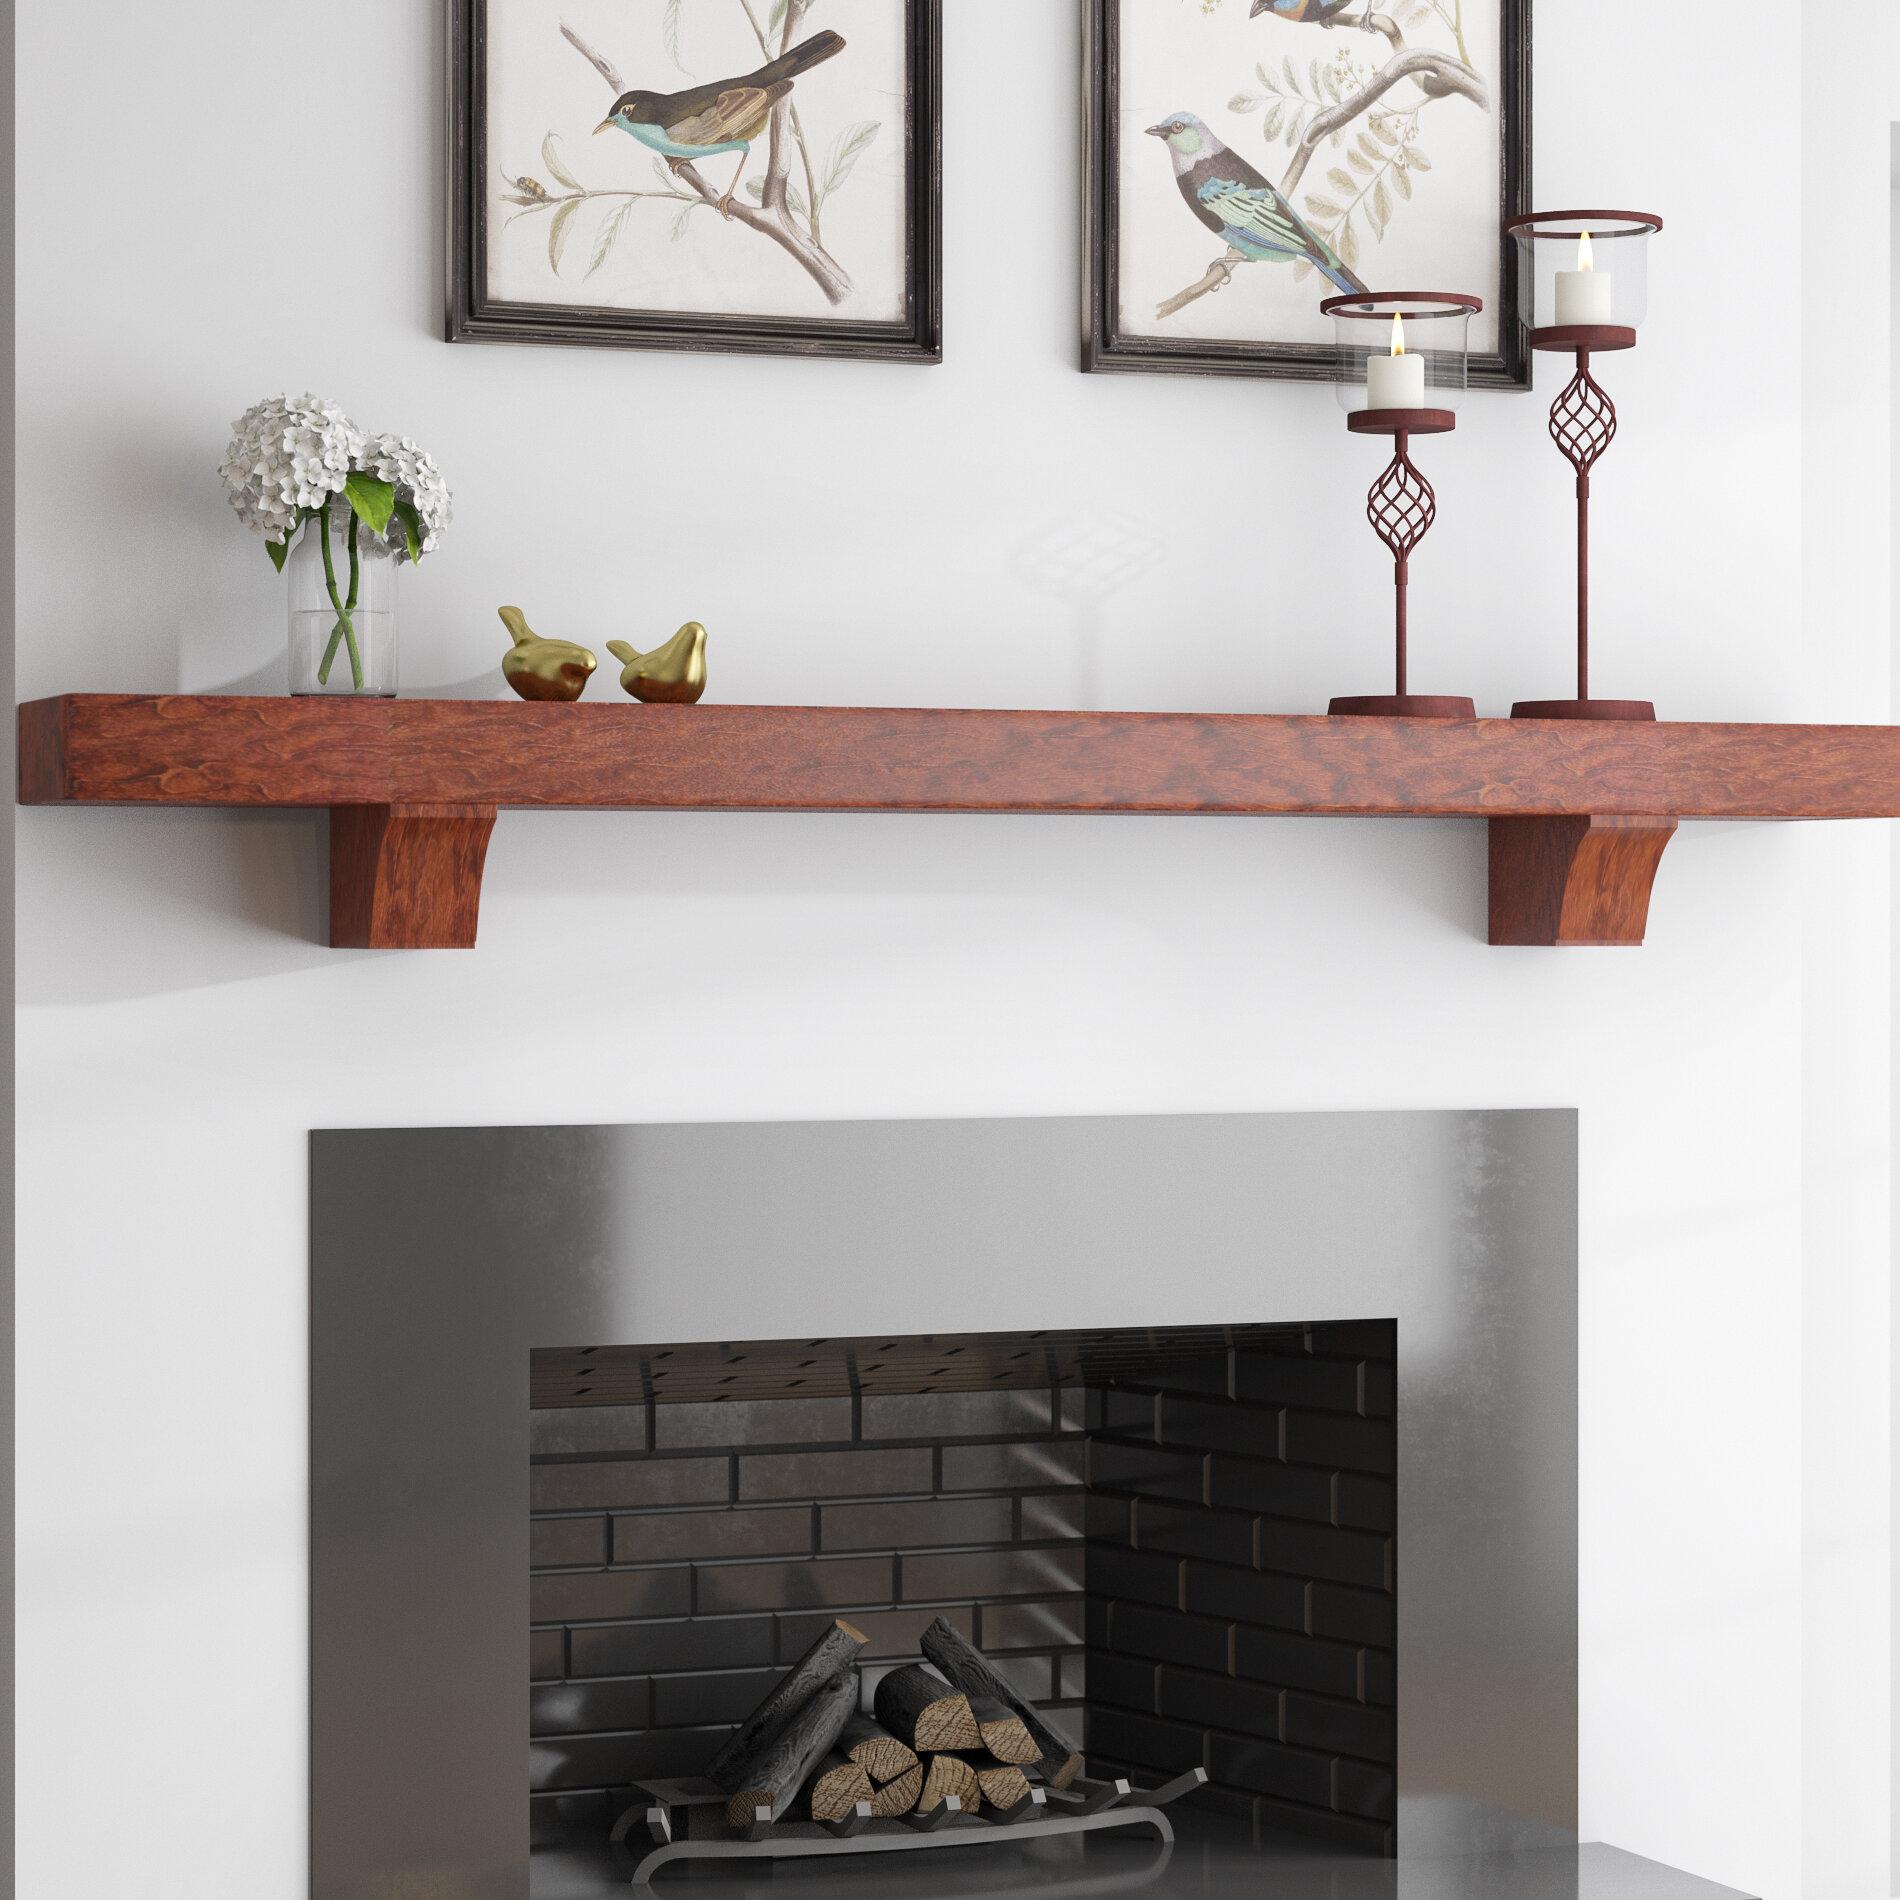 Wall mantle shelf Full Wall Fireplace Sterlinghdcom Charlton Home Beddington Fireplace Mantel Shelf Wayfair